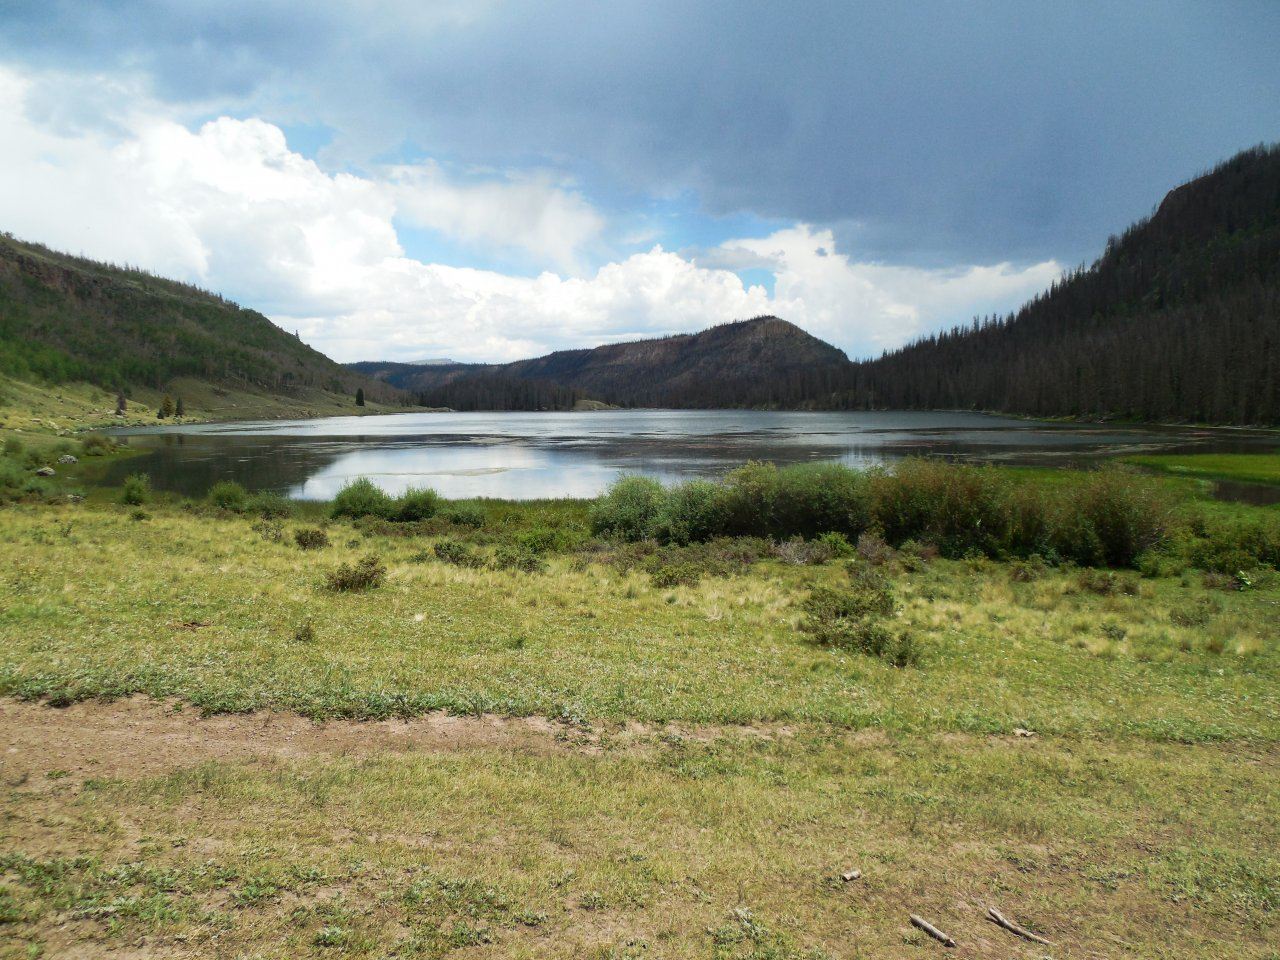 20140810_Q_Regan Lake.jpg